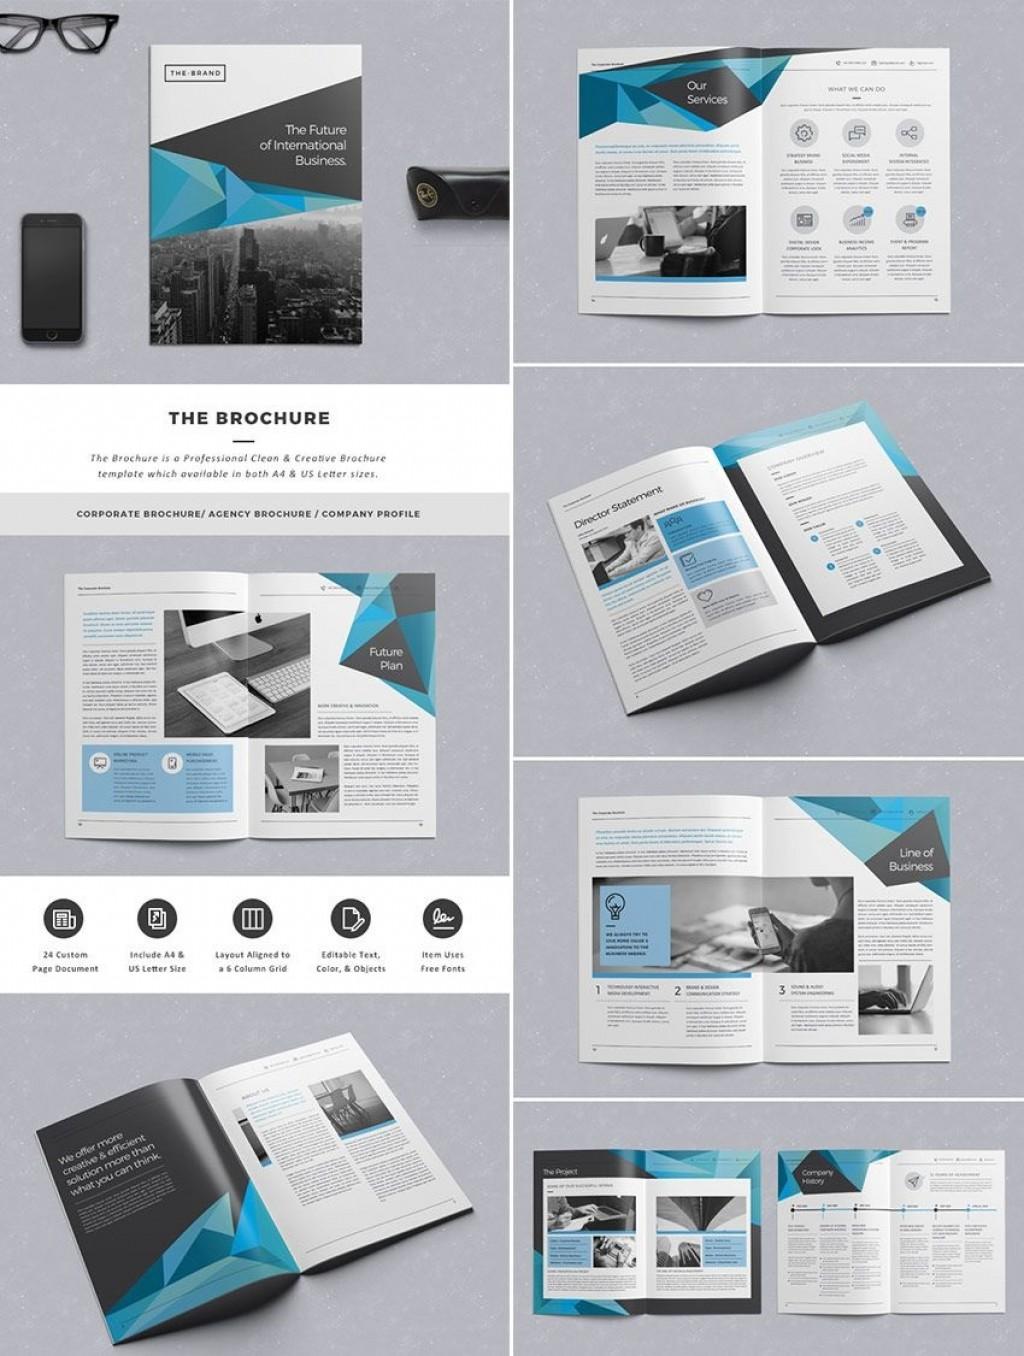 000 Formidable In Design Flyer Template Highest Quality  Indesign Free Adobe DownloadLarge